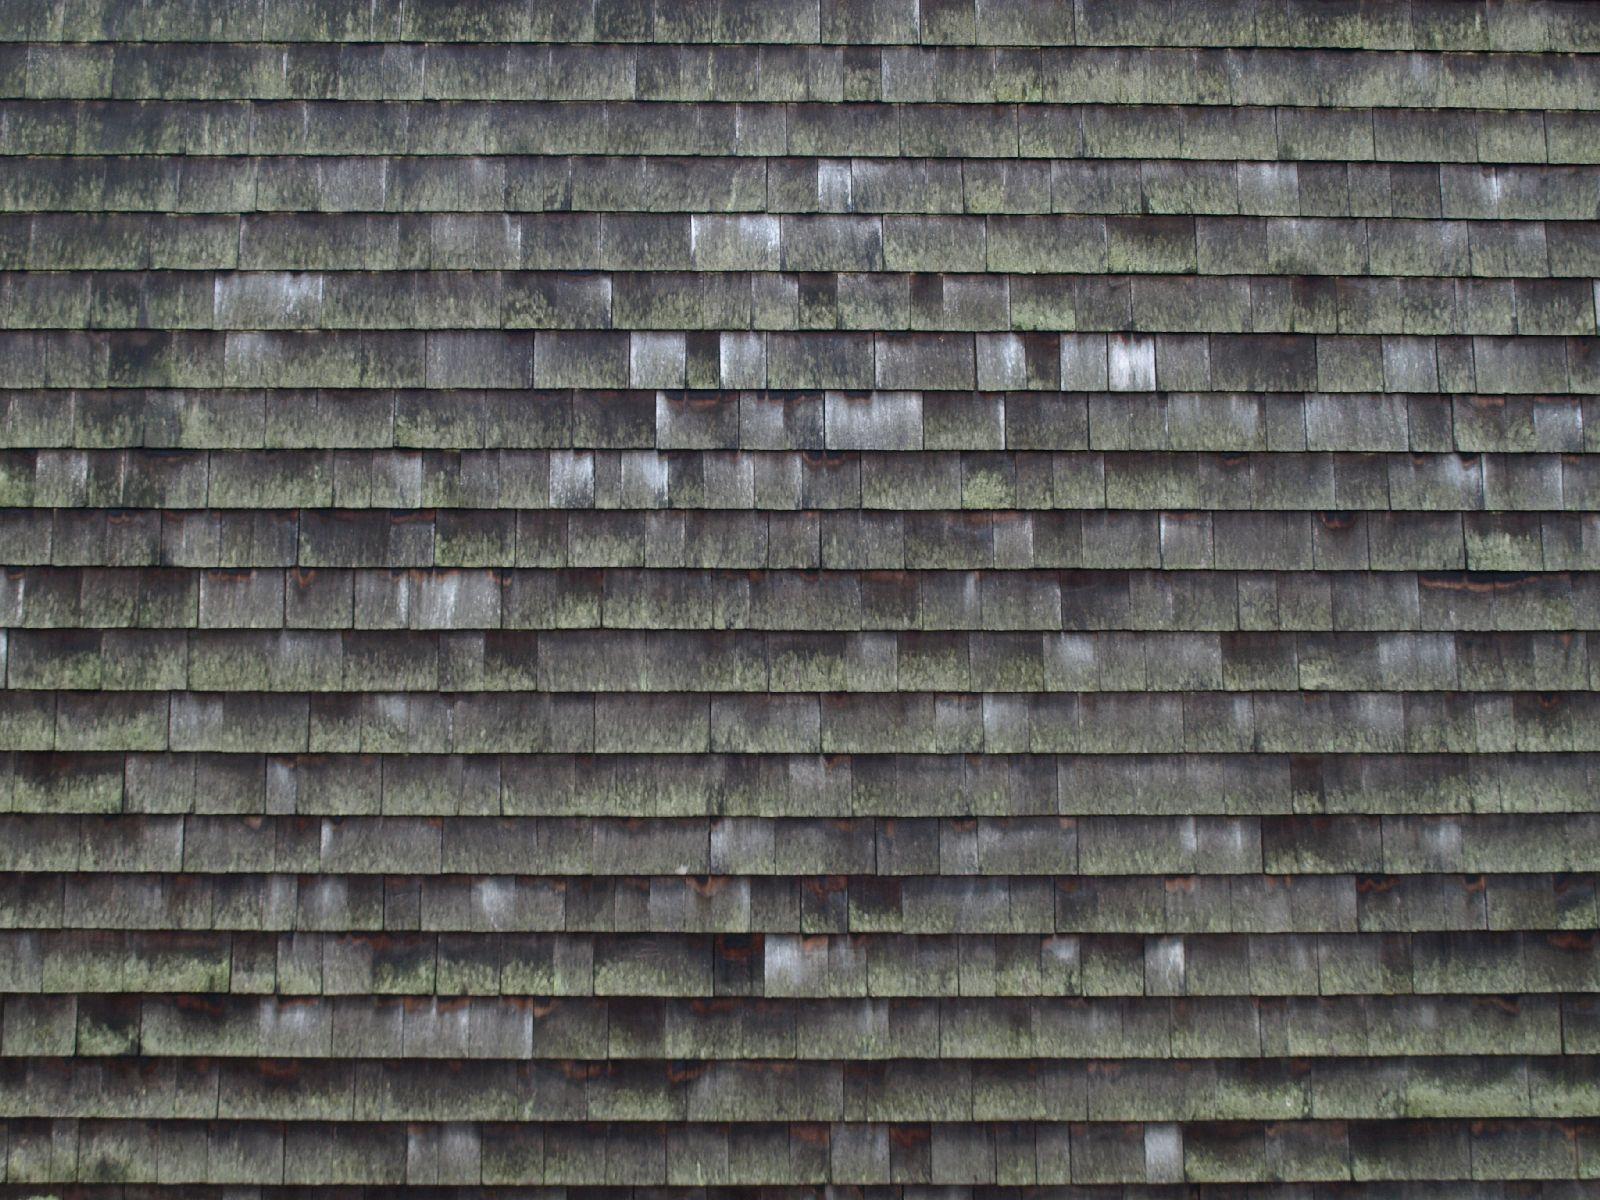 Wood_Texture_A_PB236795